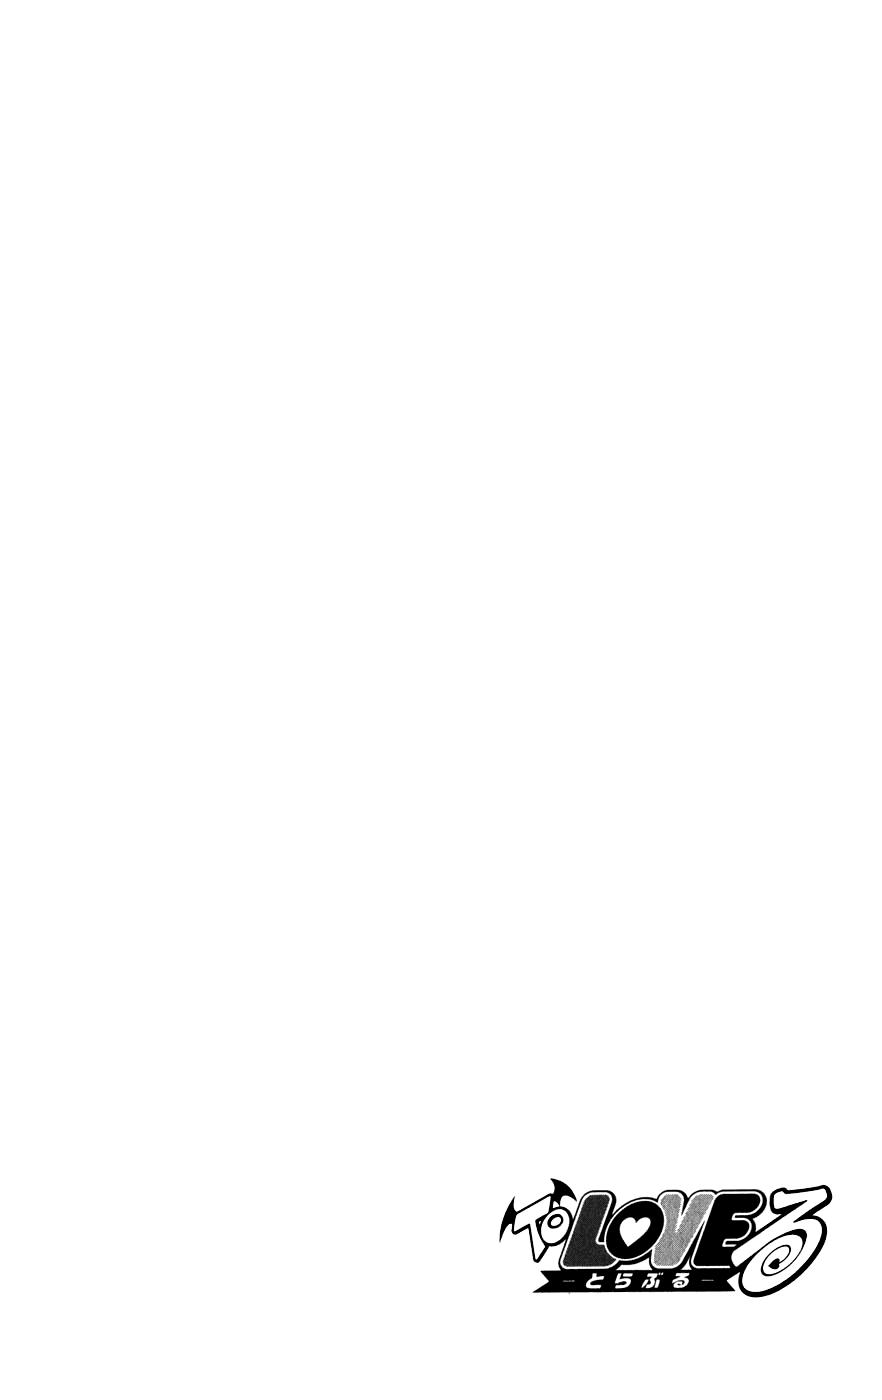 Манга Любовные неприятности / To Love-Ru  - Том 9 Глава 76 Страница 20